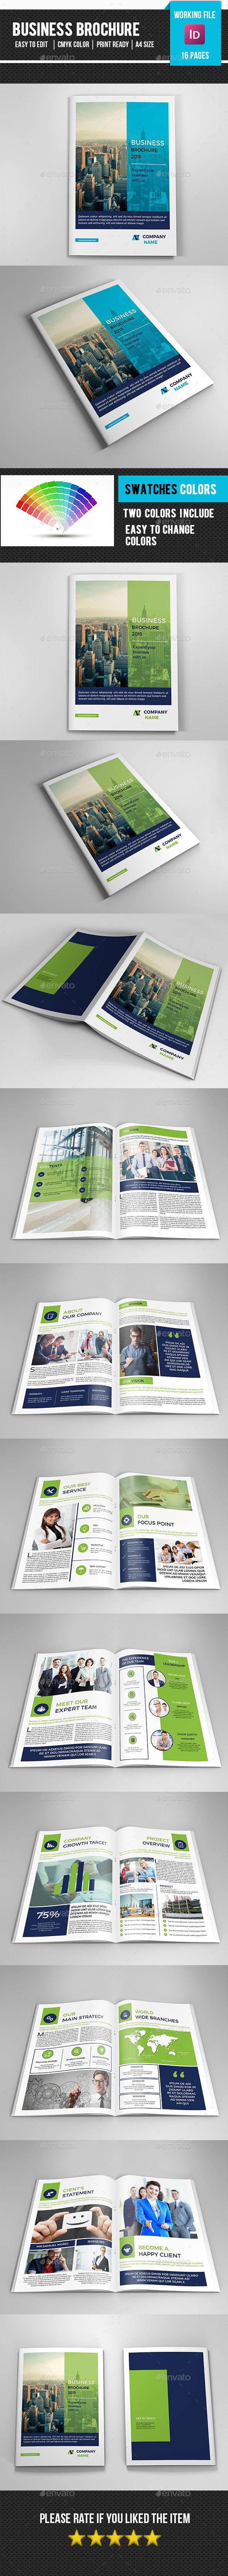 Corporate Bifold Brochure-V317 - Catalogs Brochures